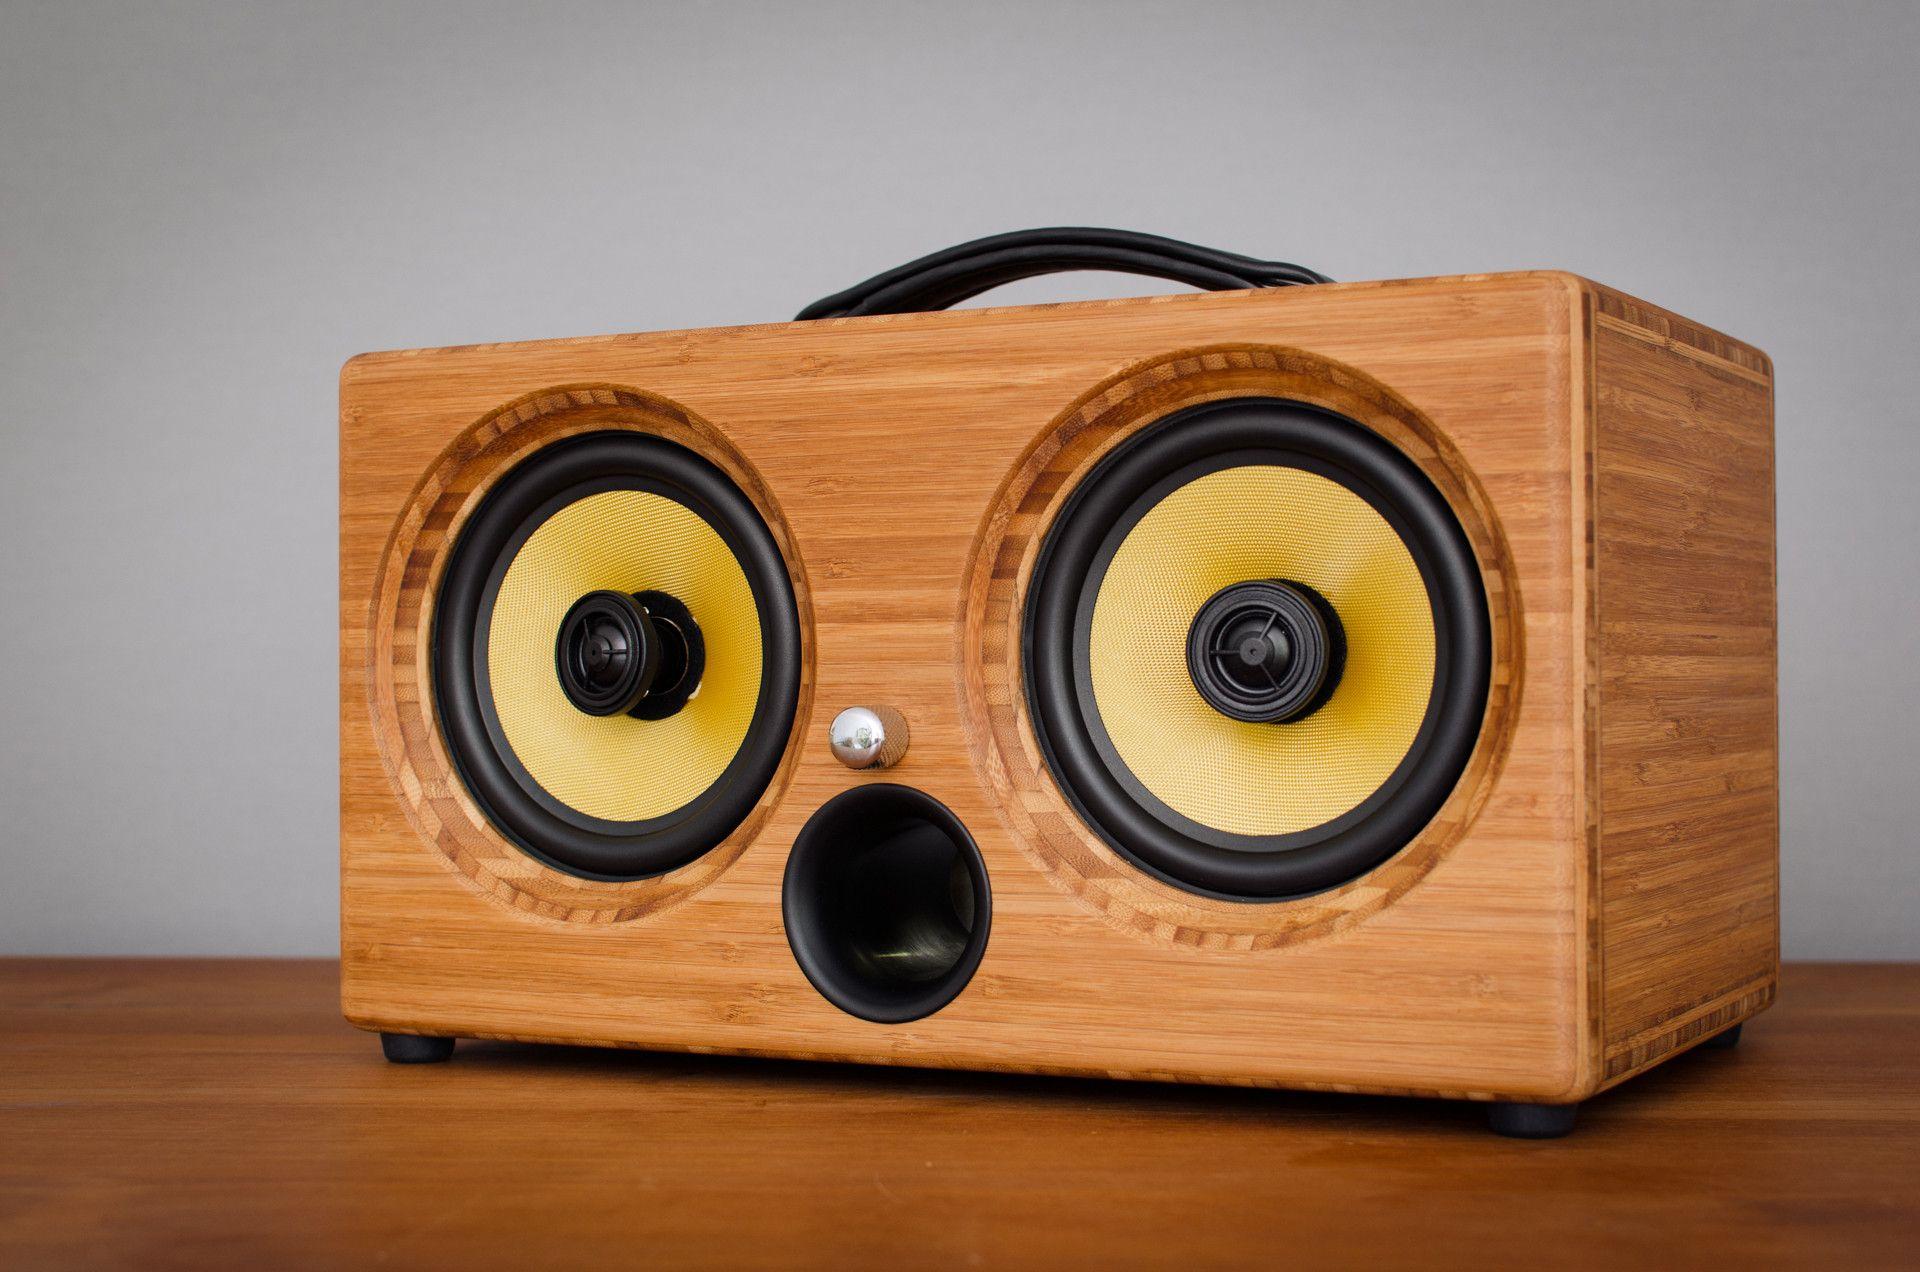 thodio ibox™ xc side pressed caramel bamboo | speakers, caramel